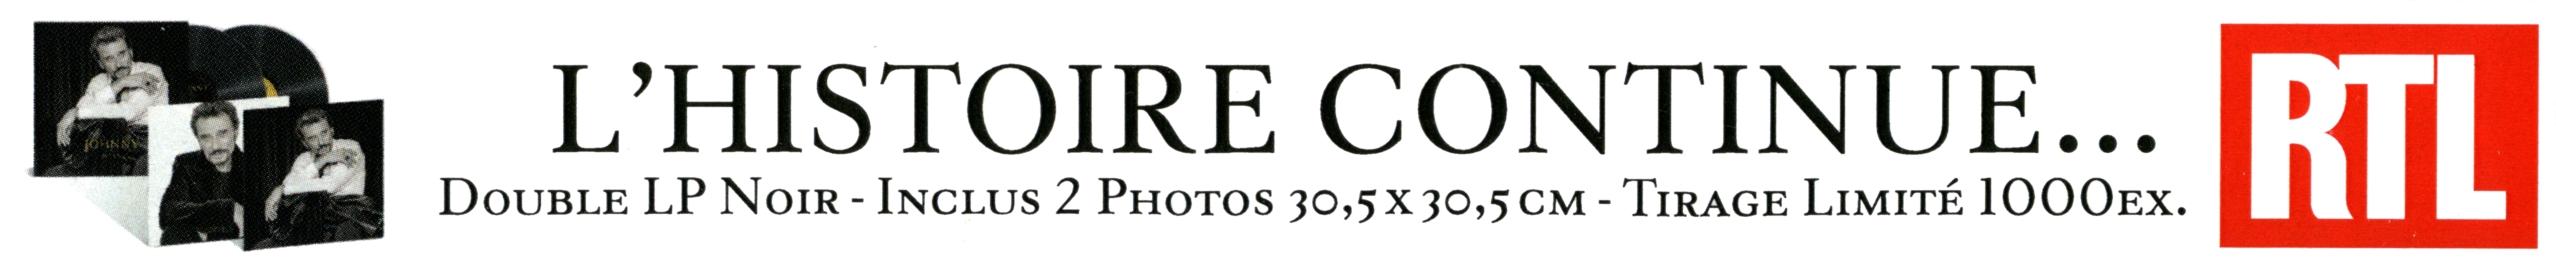 Visuel Acte II Edition exclusive Carrefour Acte_i27